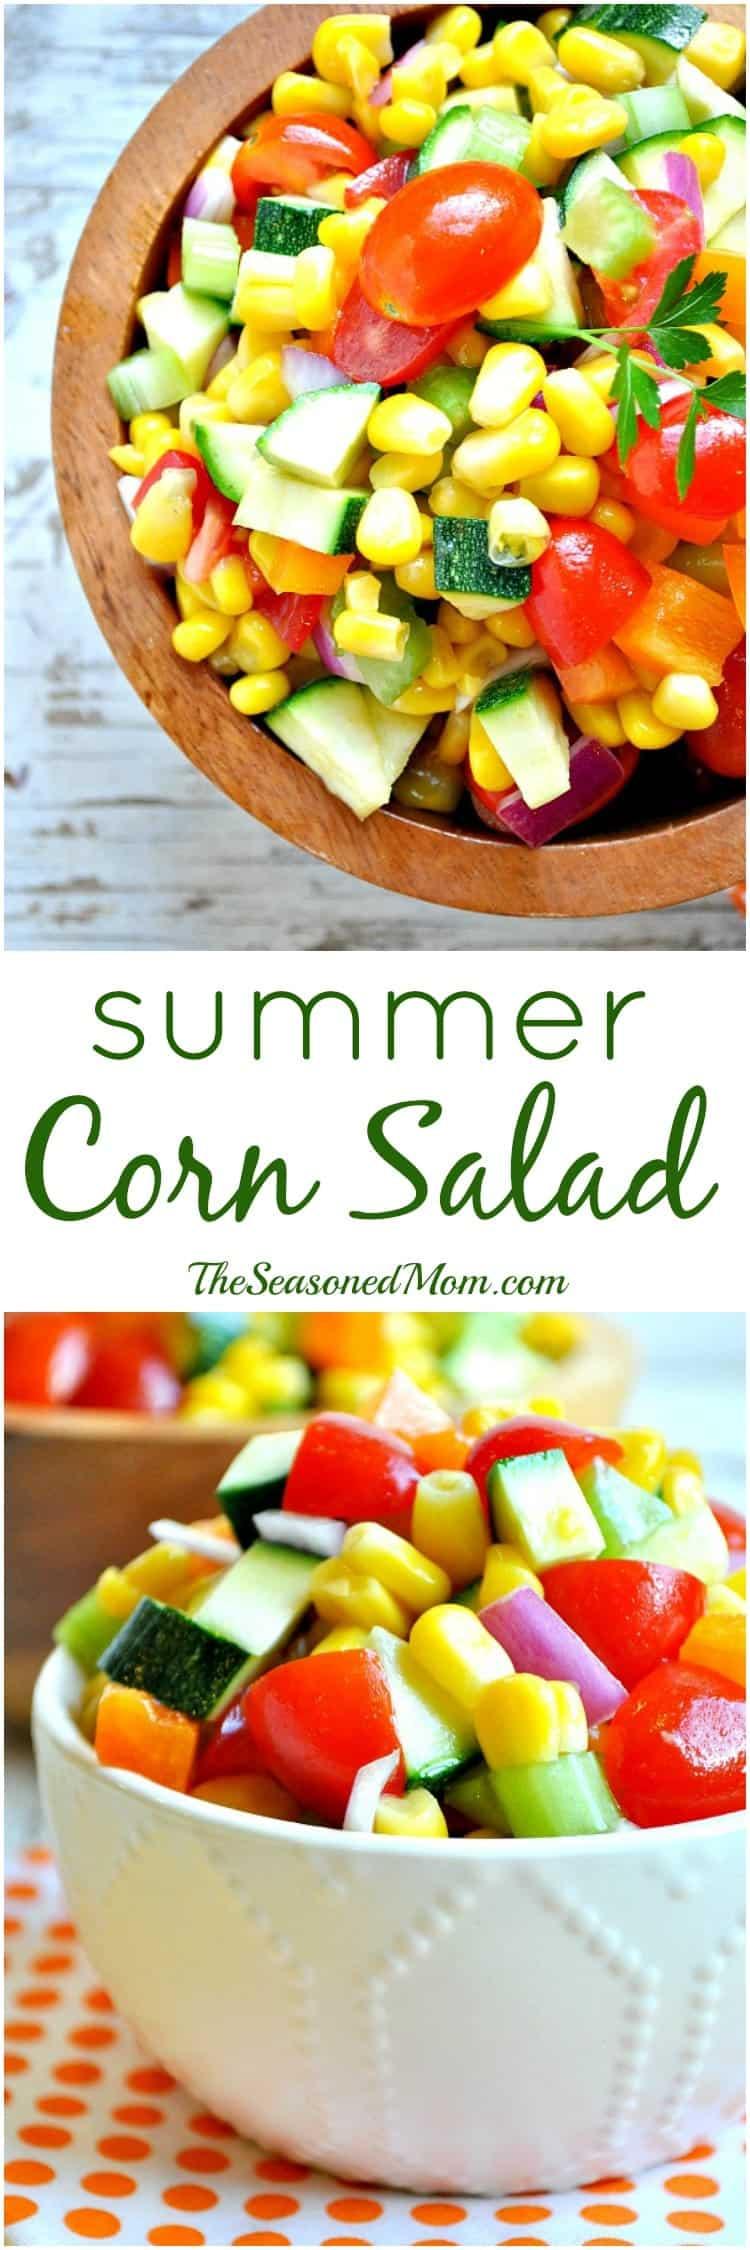 Summer Corn Salad - The Seasoned Mom